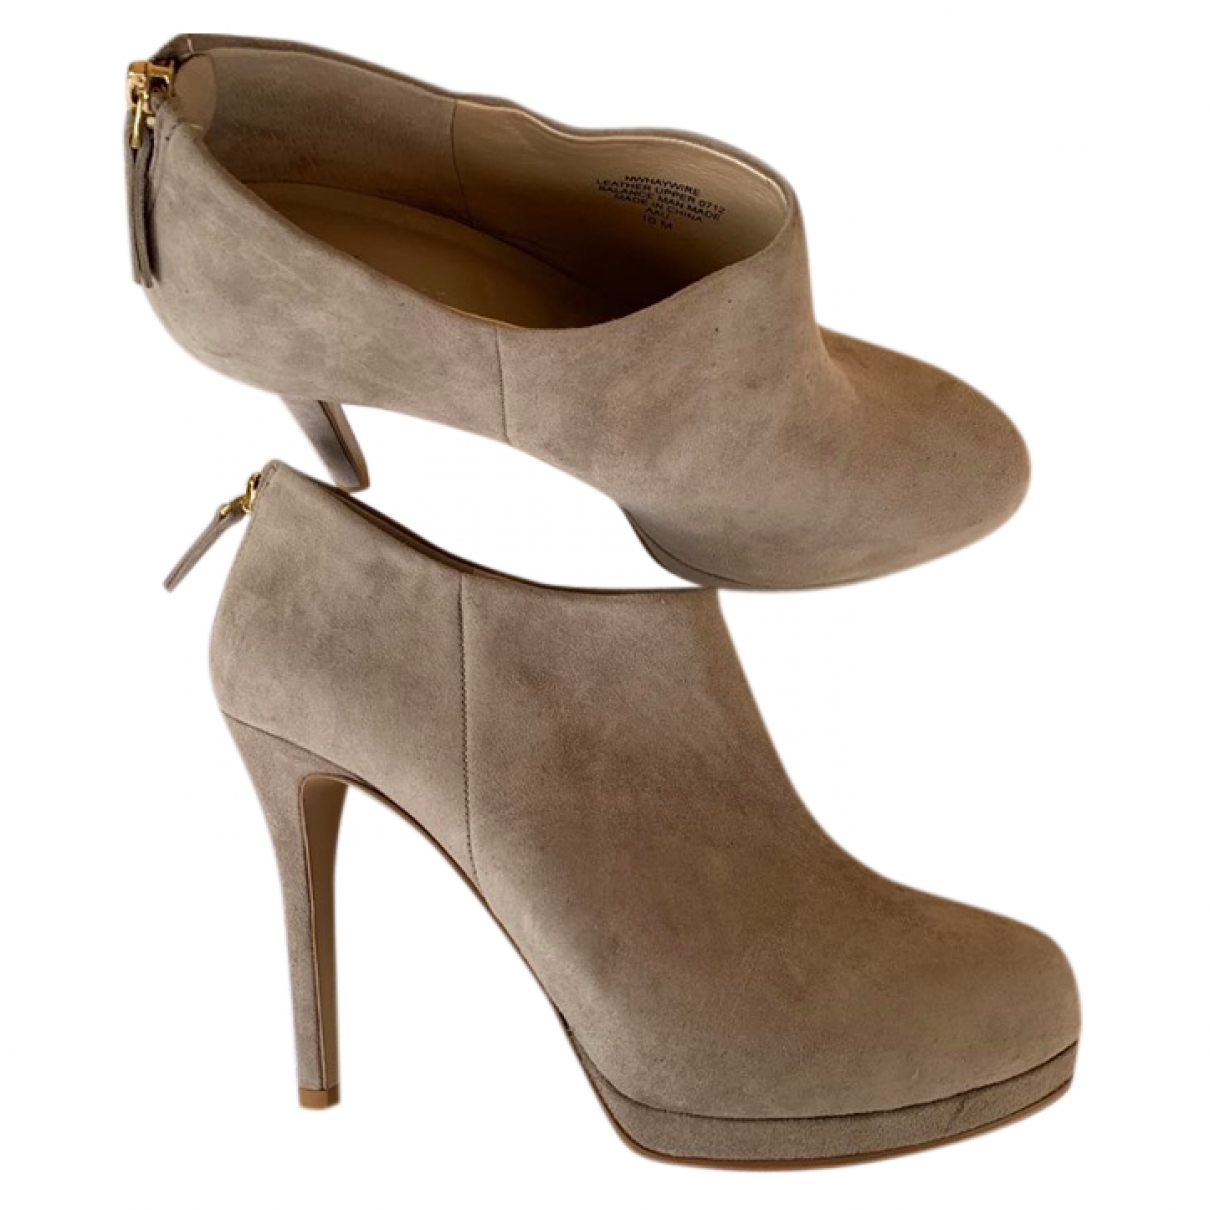 Nine West \N Beige Suede Ankle boots for Women 42 IT